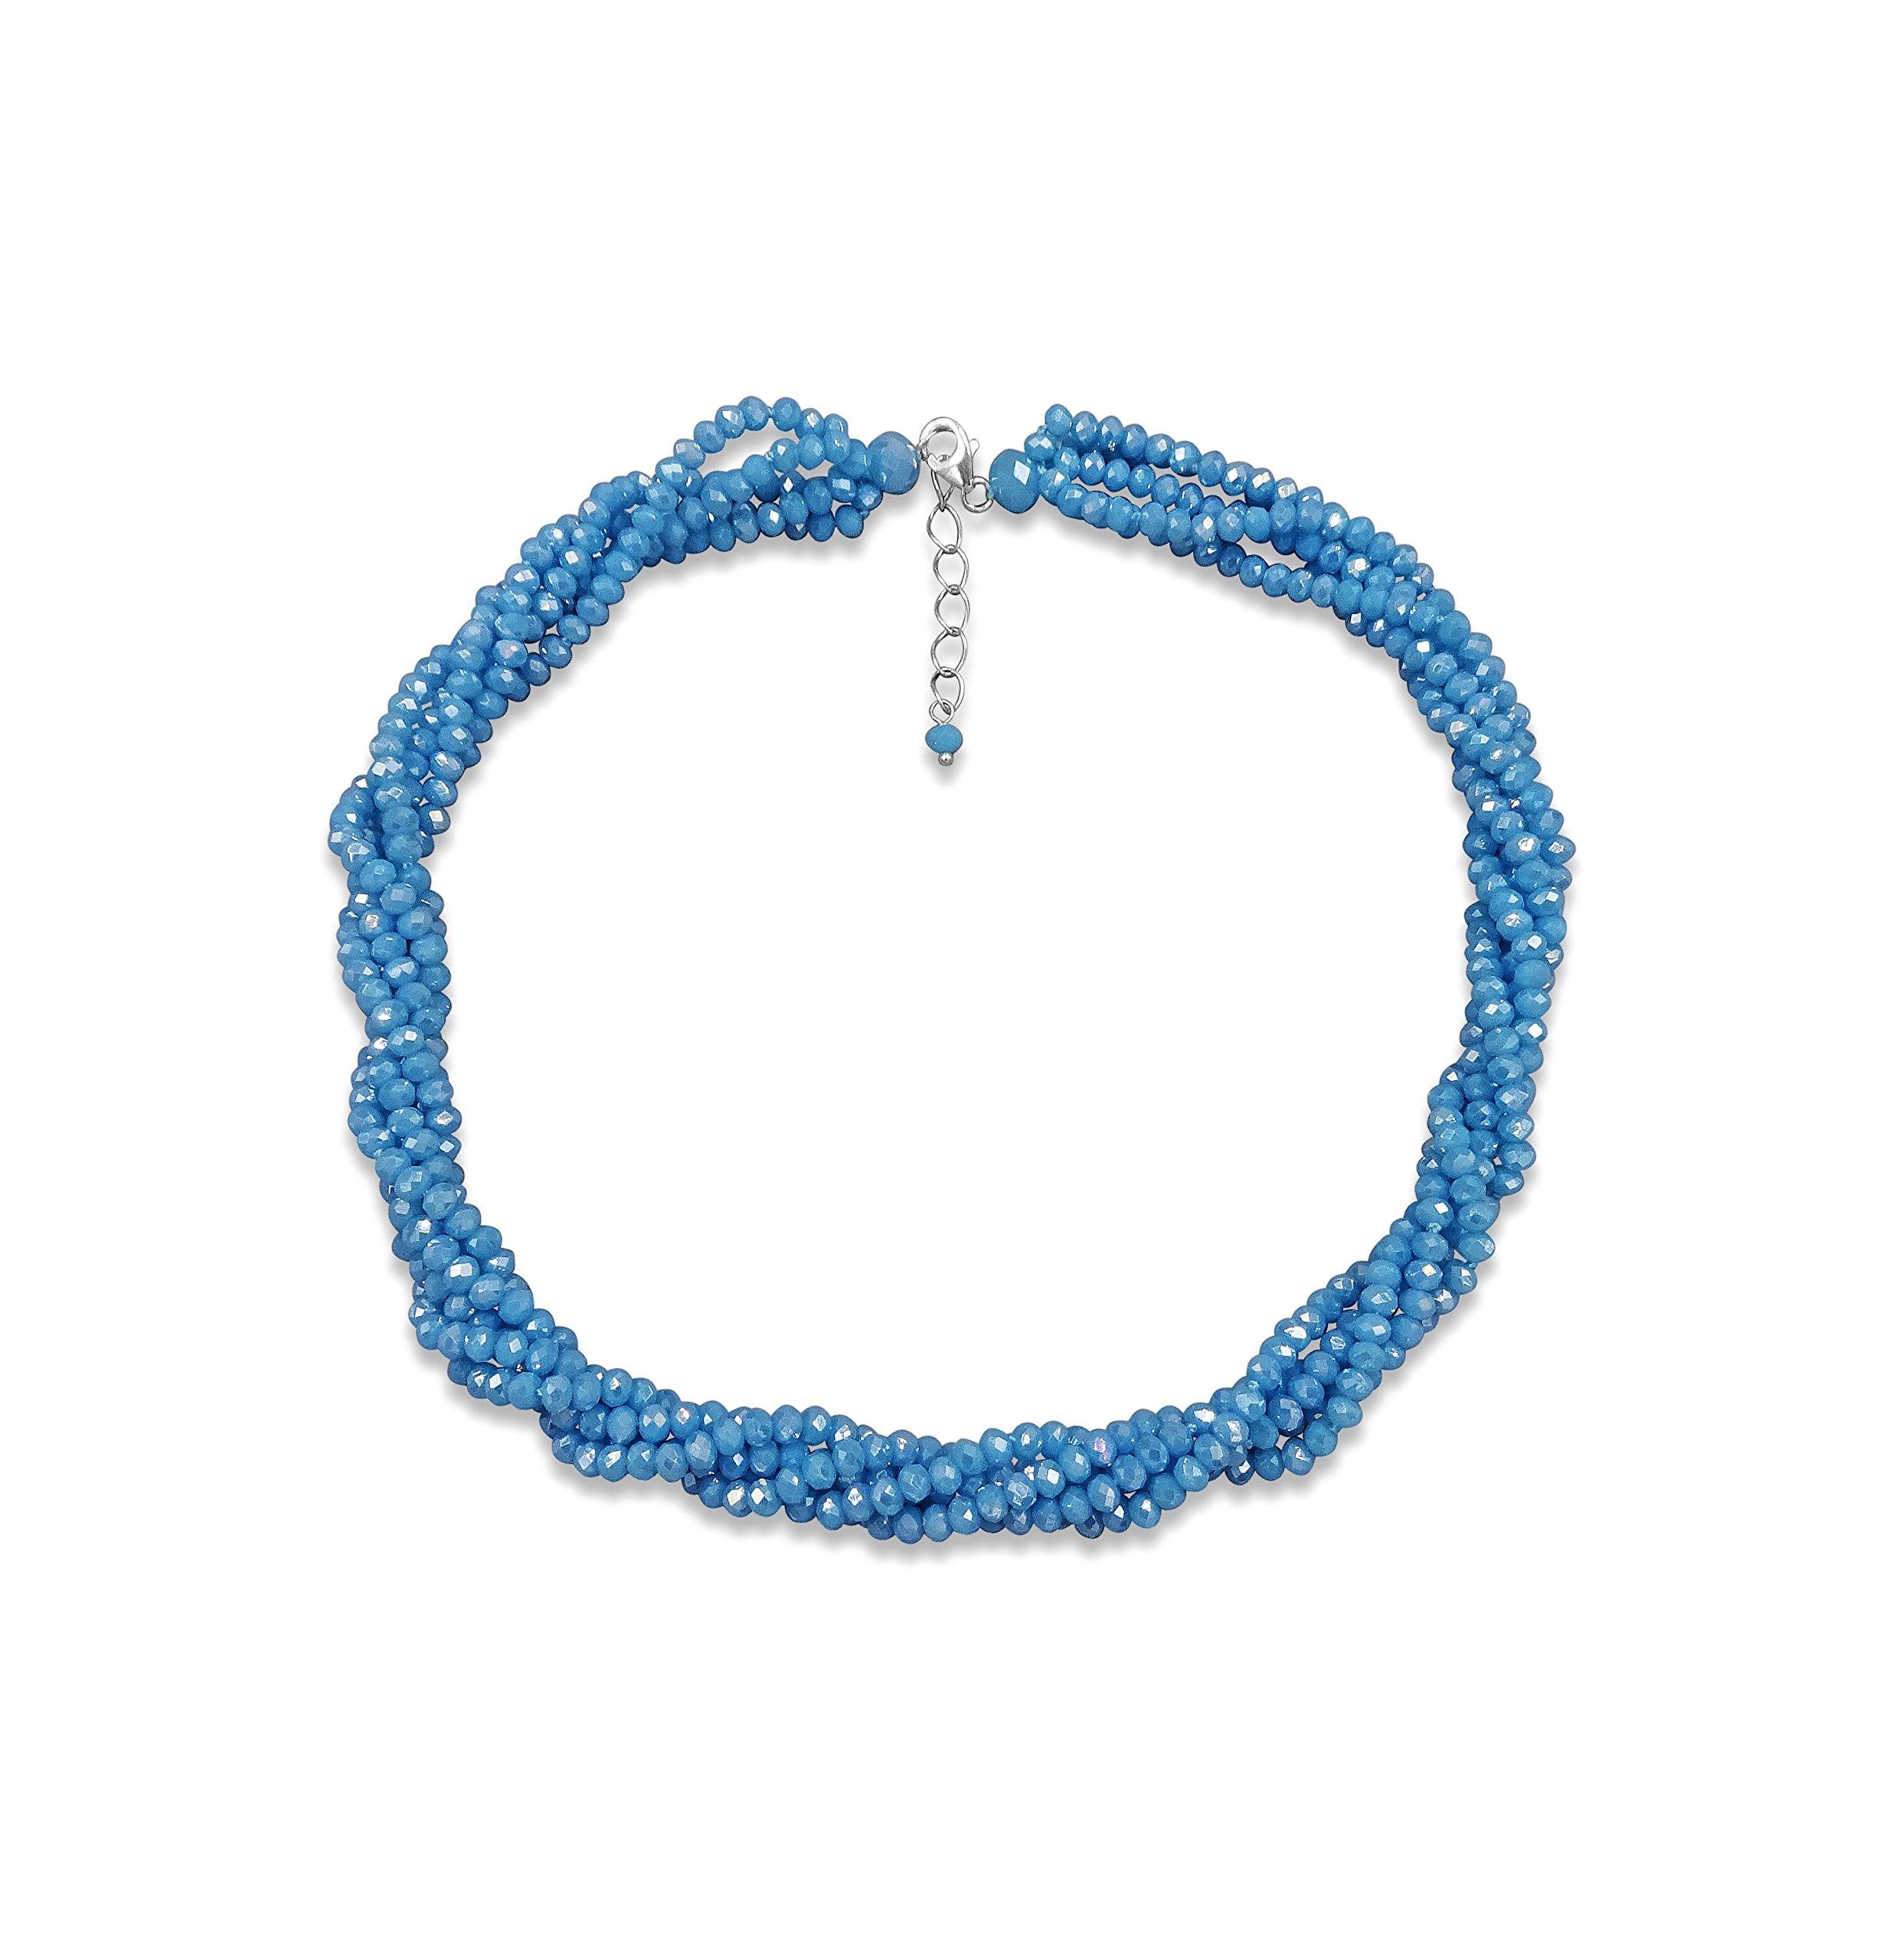 BjB Multi-Strand Layered Bib Collar Statement Crystal Necklace.